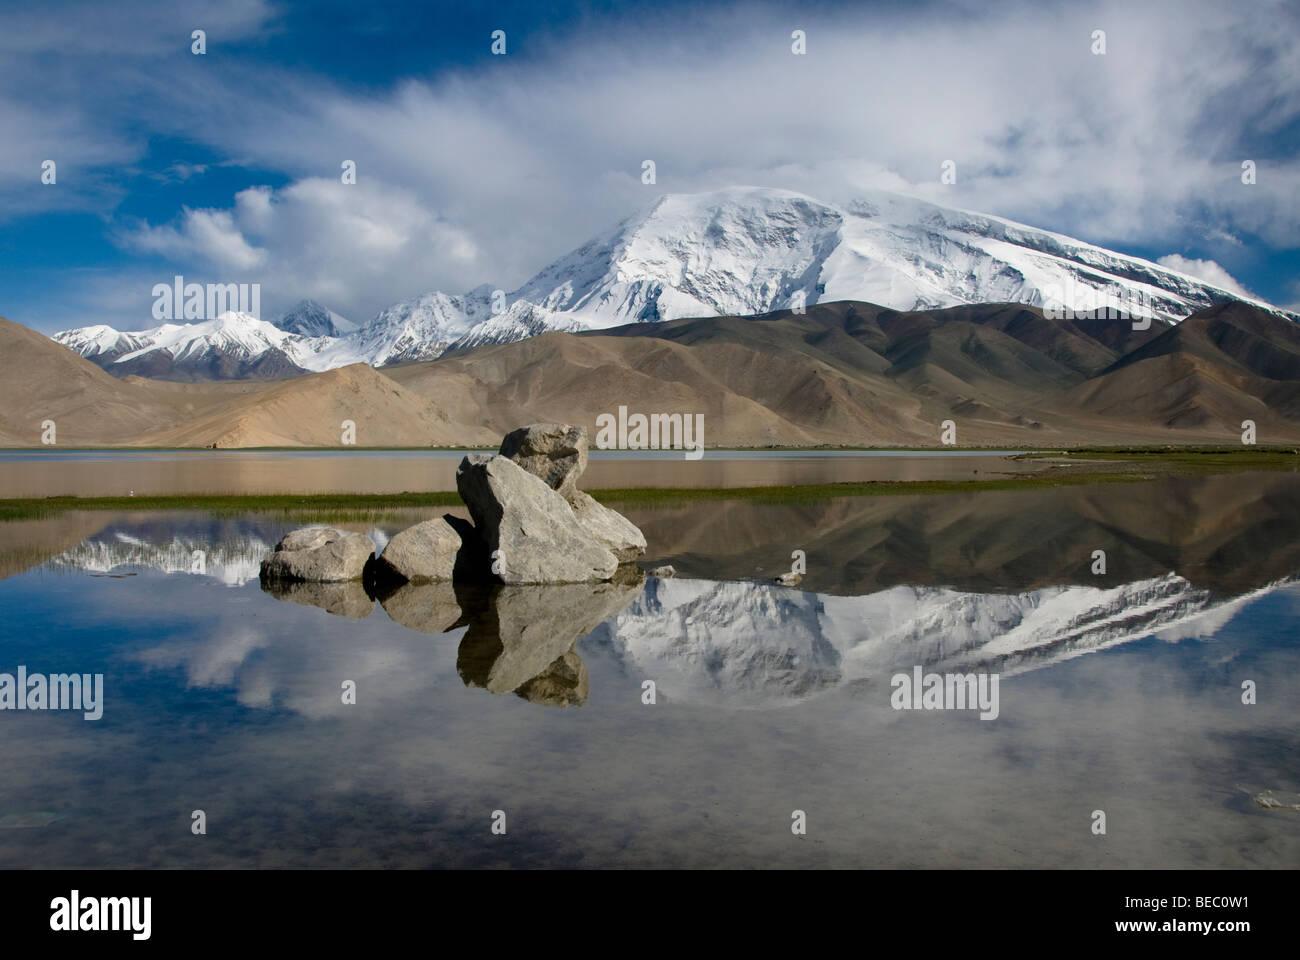 View of the Muztagh Ata in the Karakoram Mountain Range, Xinjiang Province, China. - Stock Image